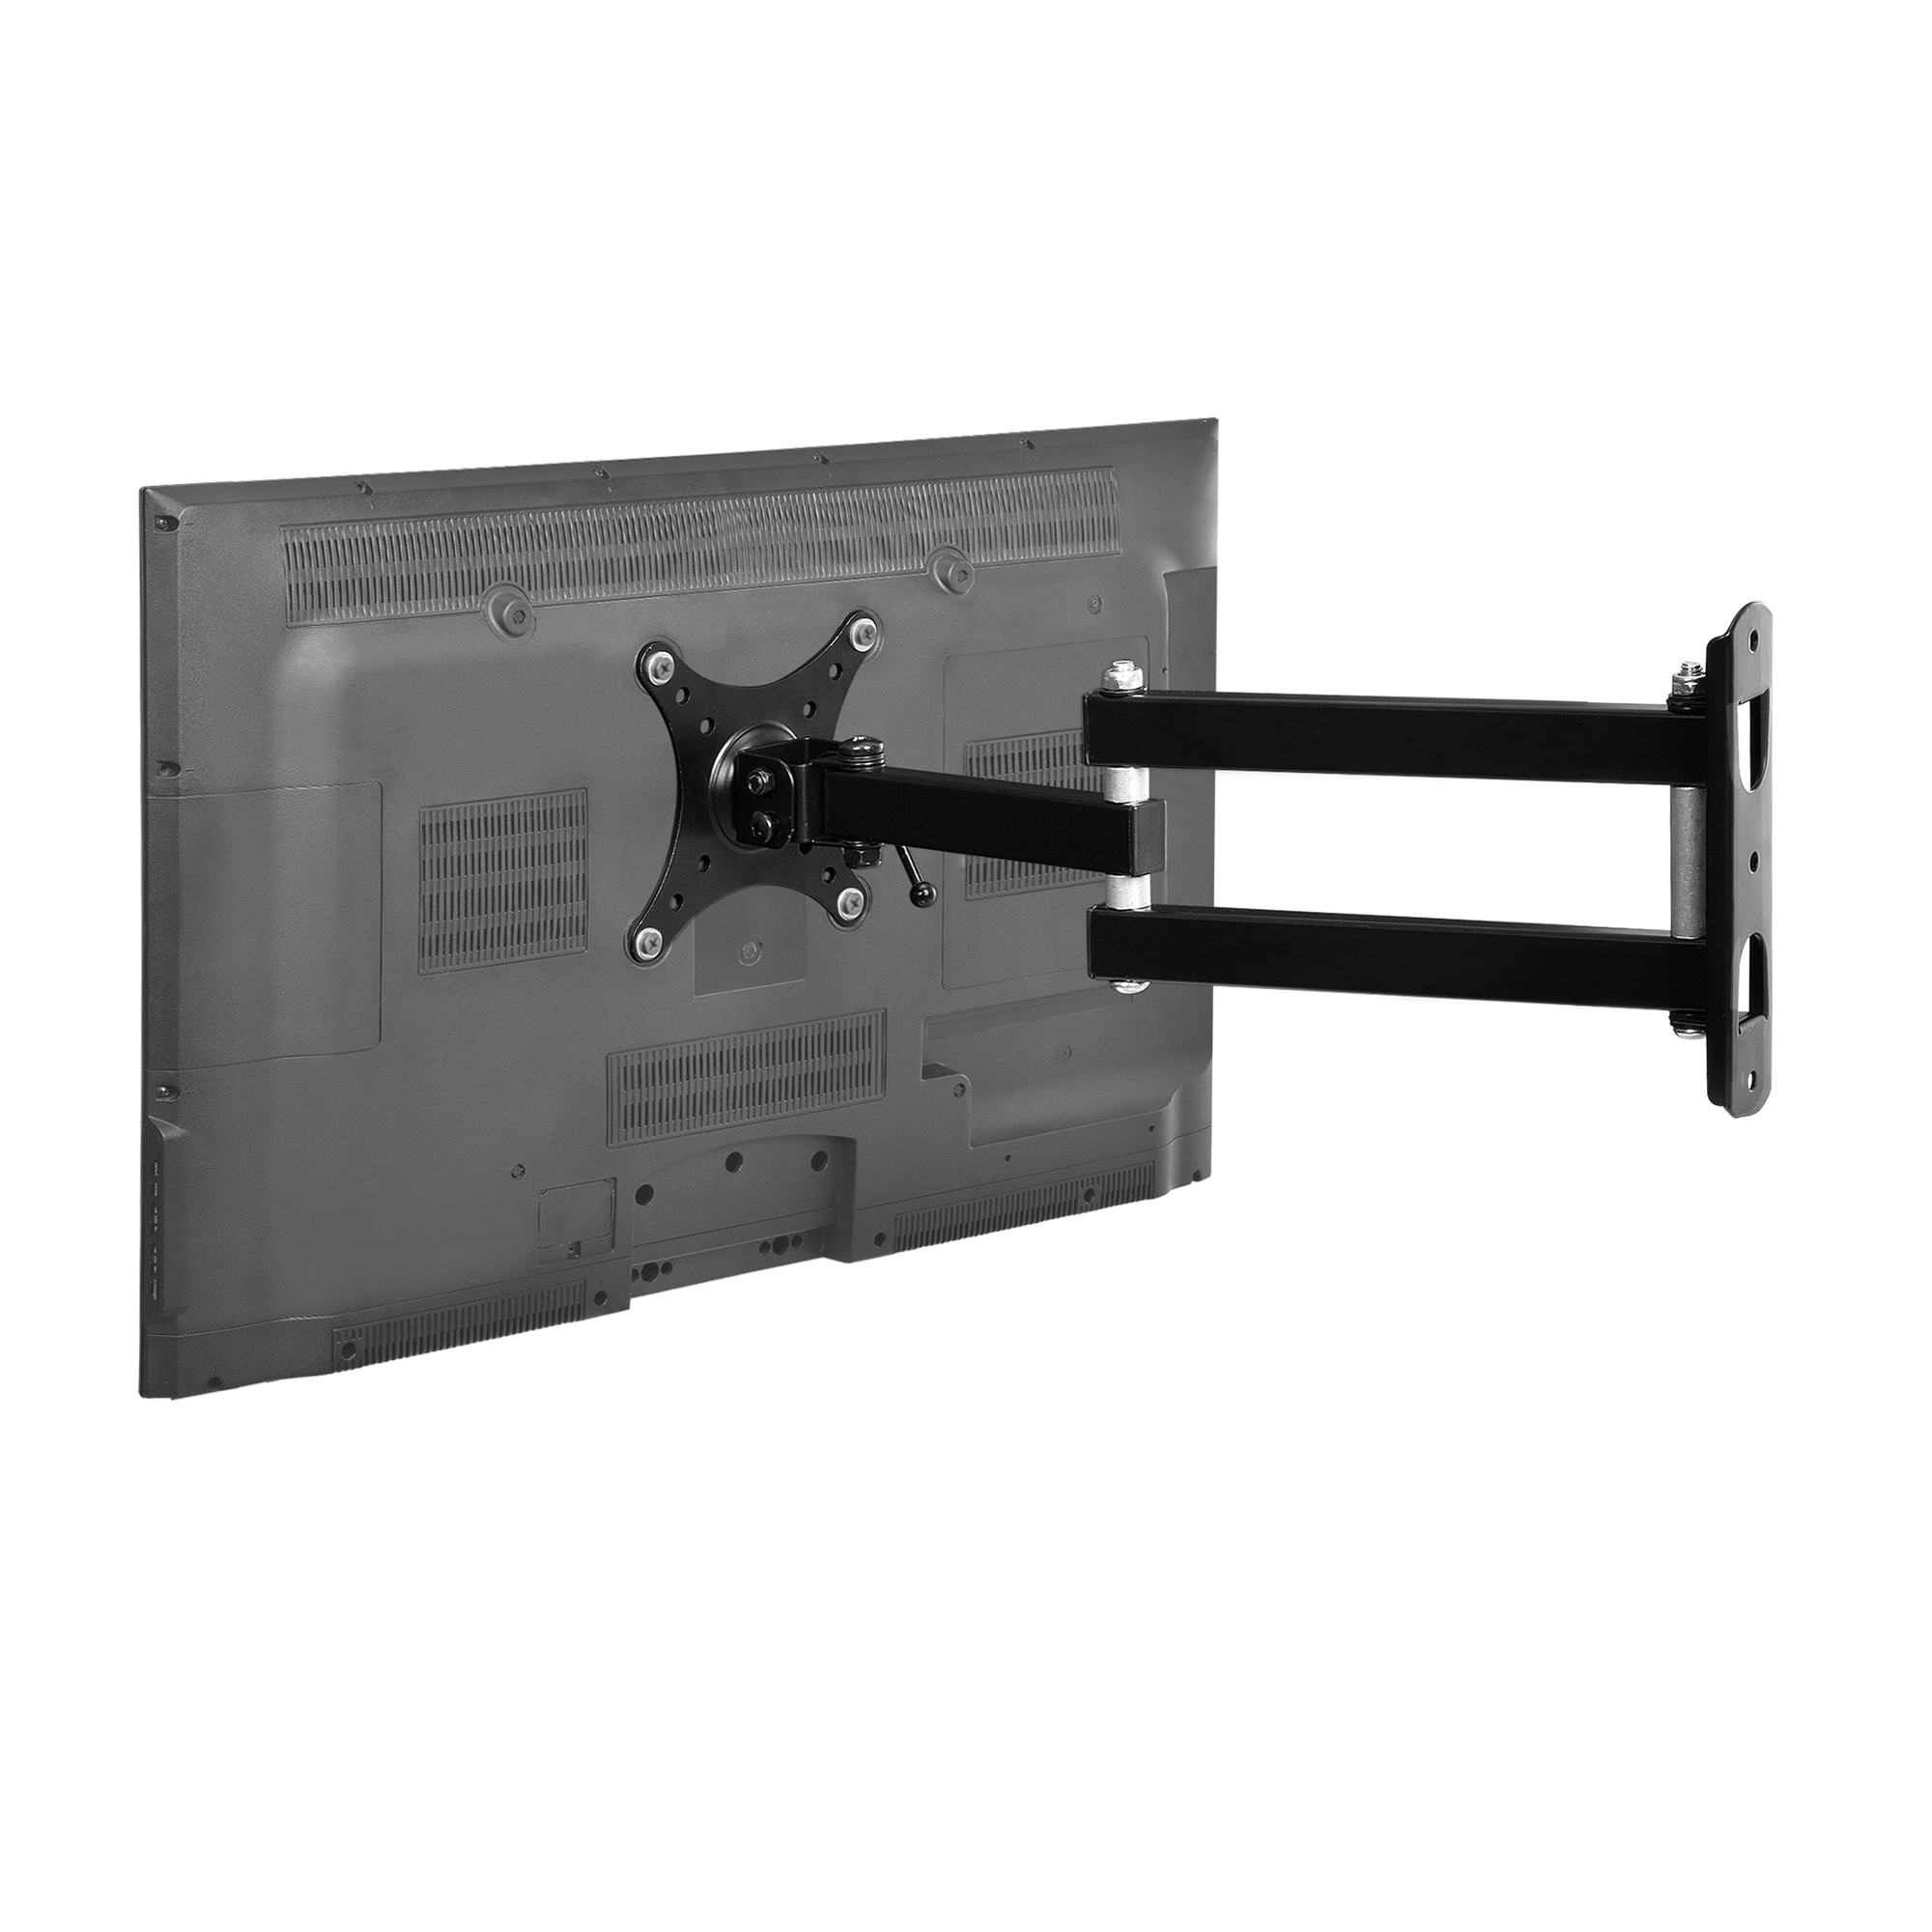 wandhalter lcd led tv fernseher wandhalterung. Black Bedroom Furniture Sets. Home Design Ideas